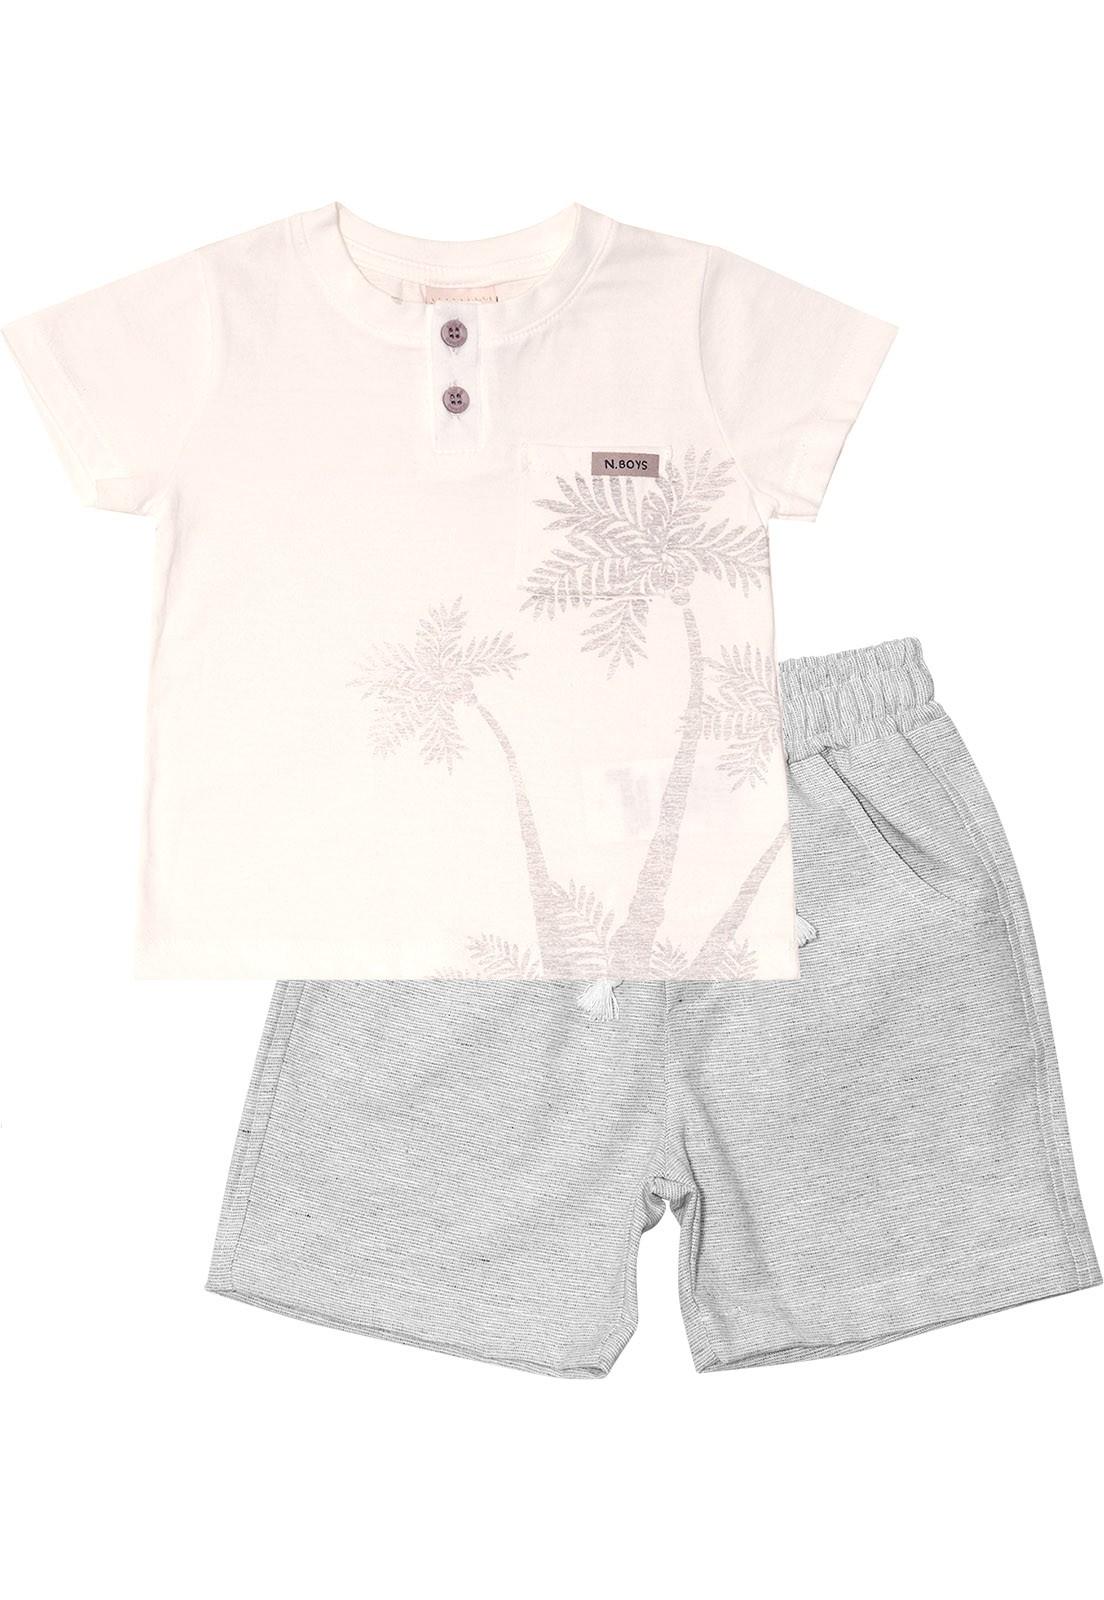 Conjunto Infantil Camiseta e Bermuda Nini&Bambini Off White  e cinza